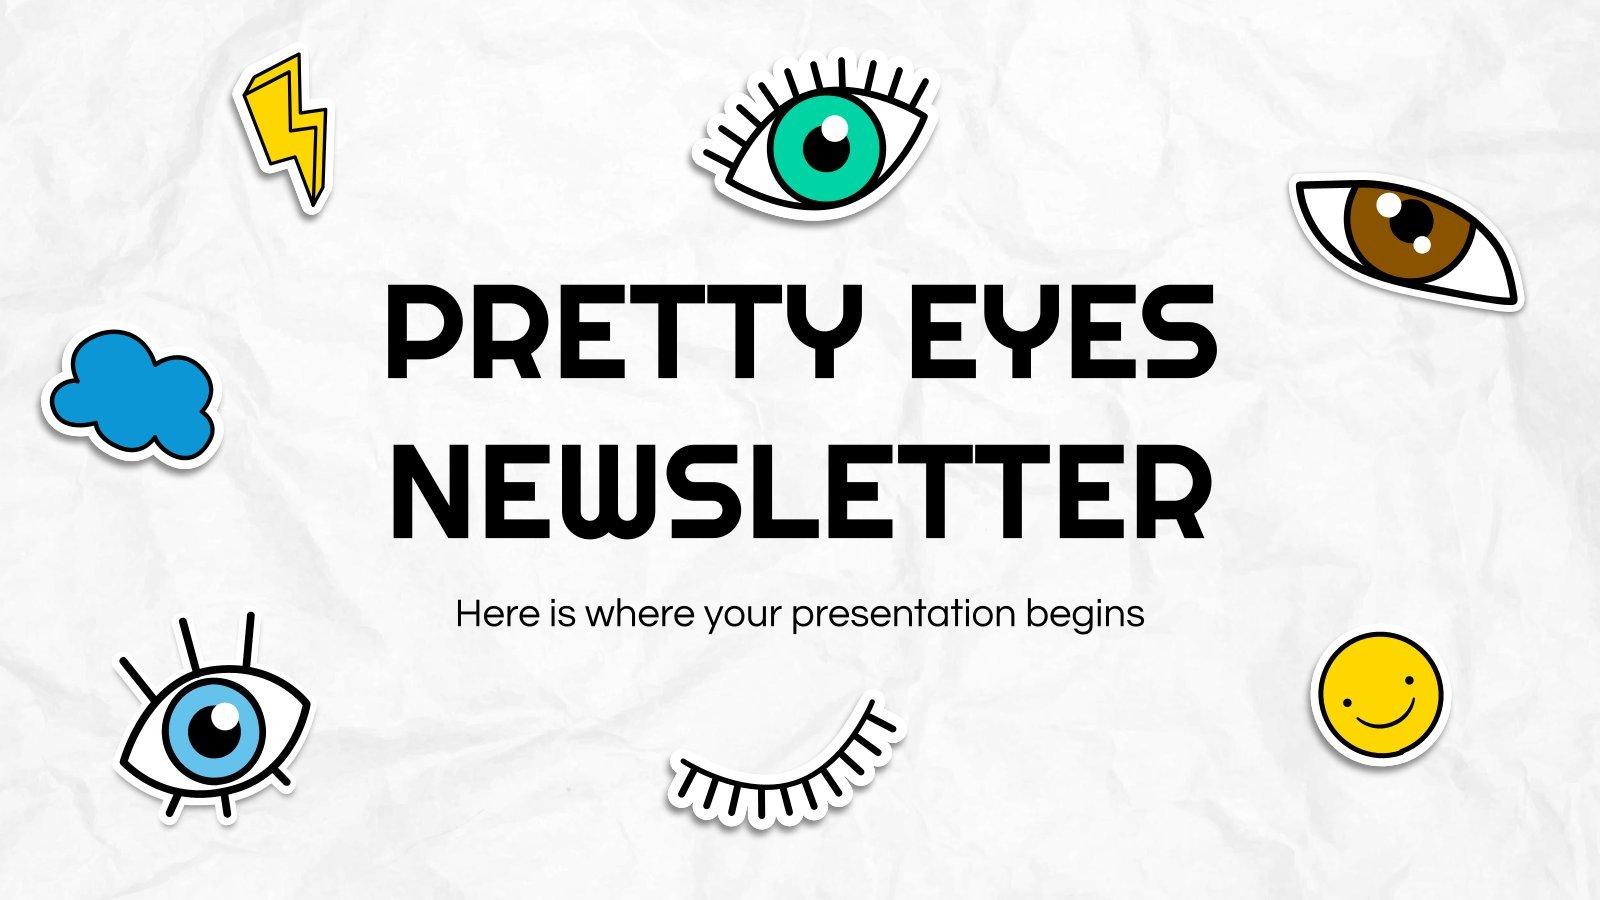 Plantilla de presentación Newsletter con ojitos